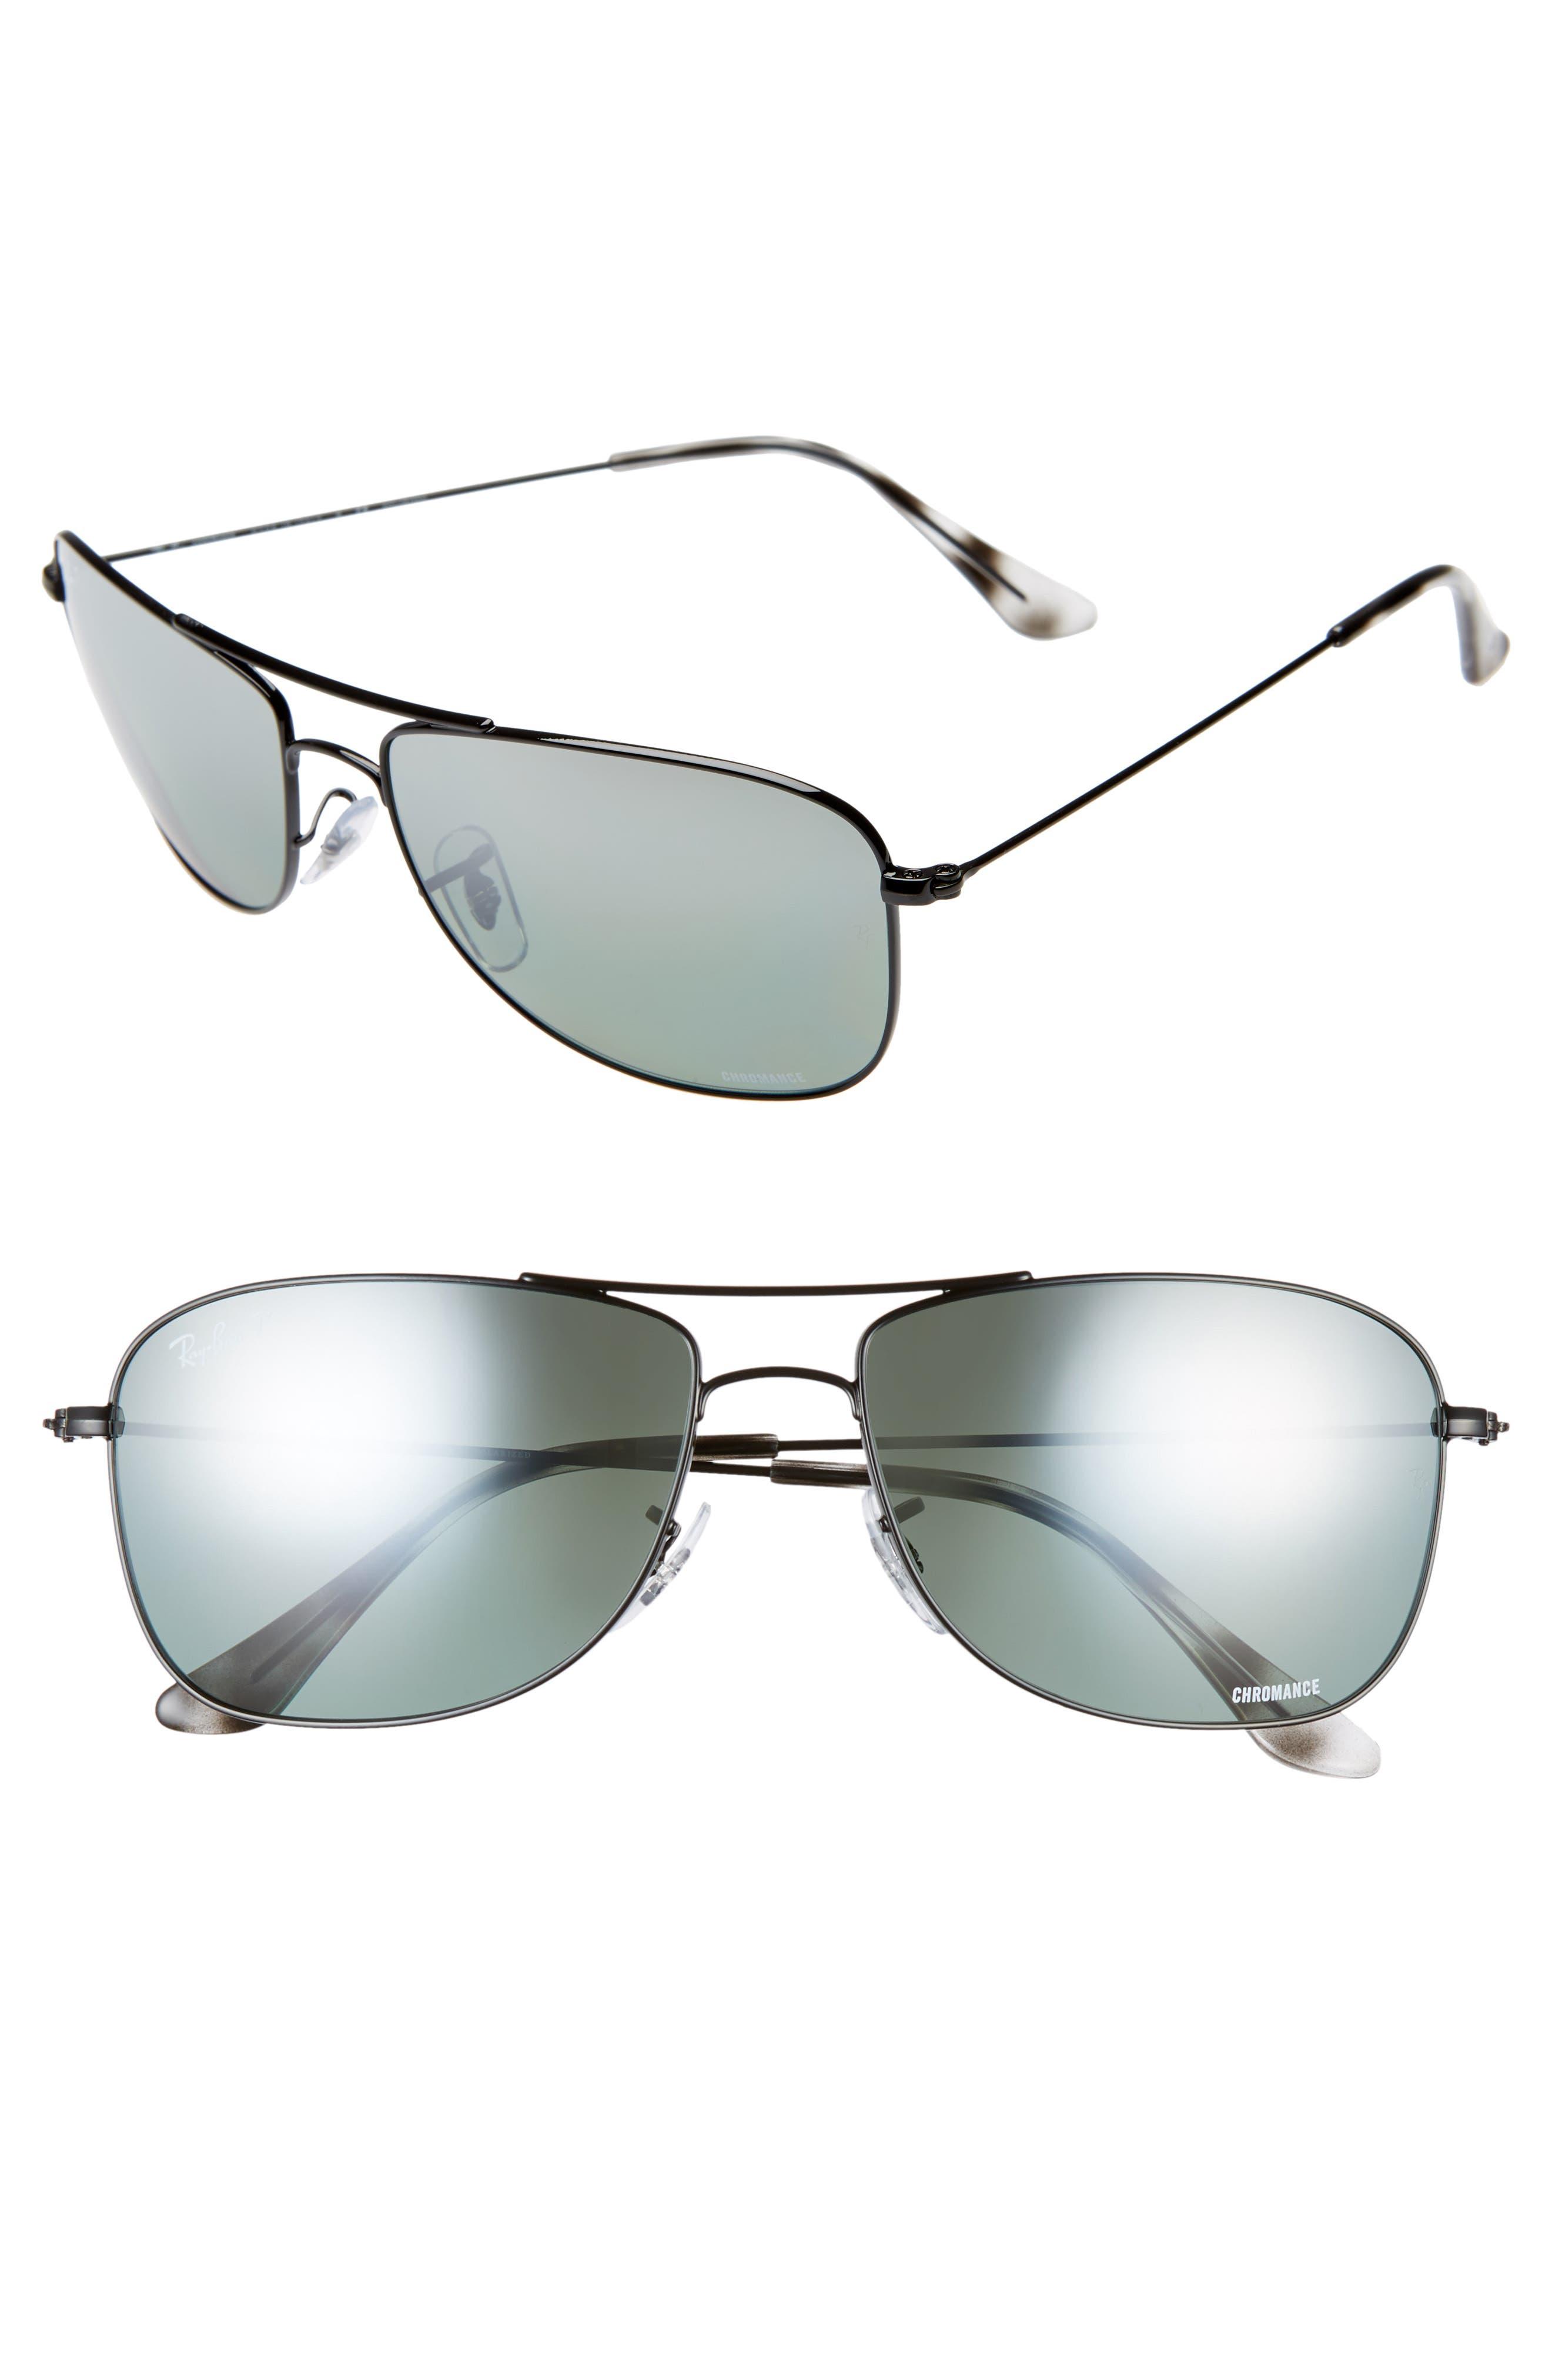 Ray-Ban 5m Chromance Aviator Sunglasses - Black